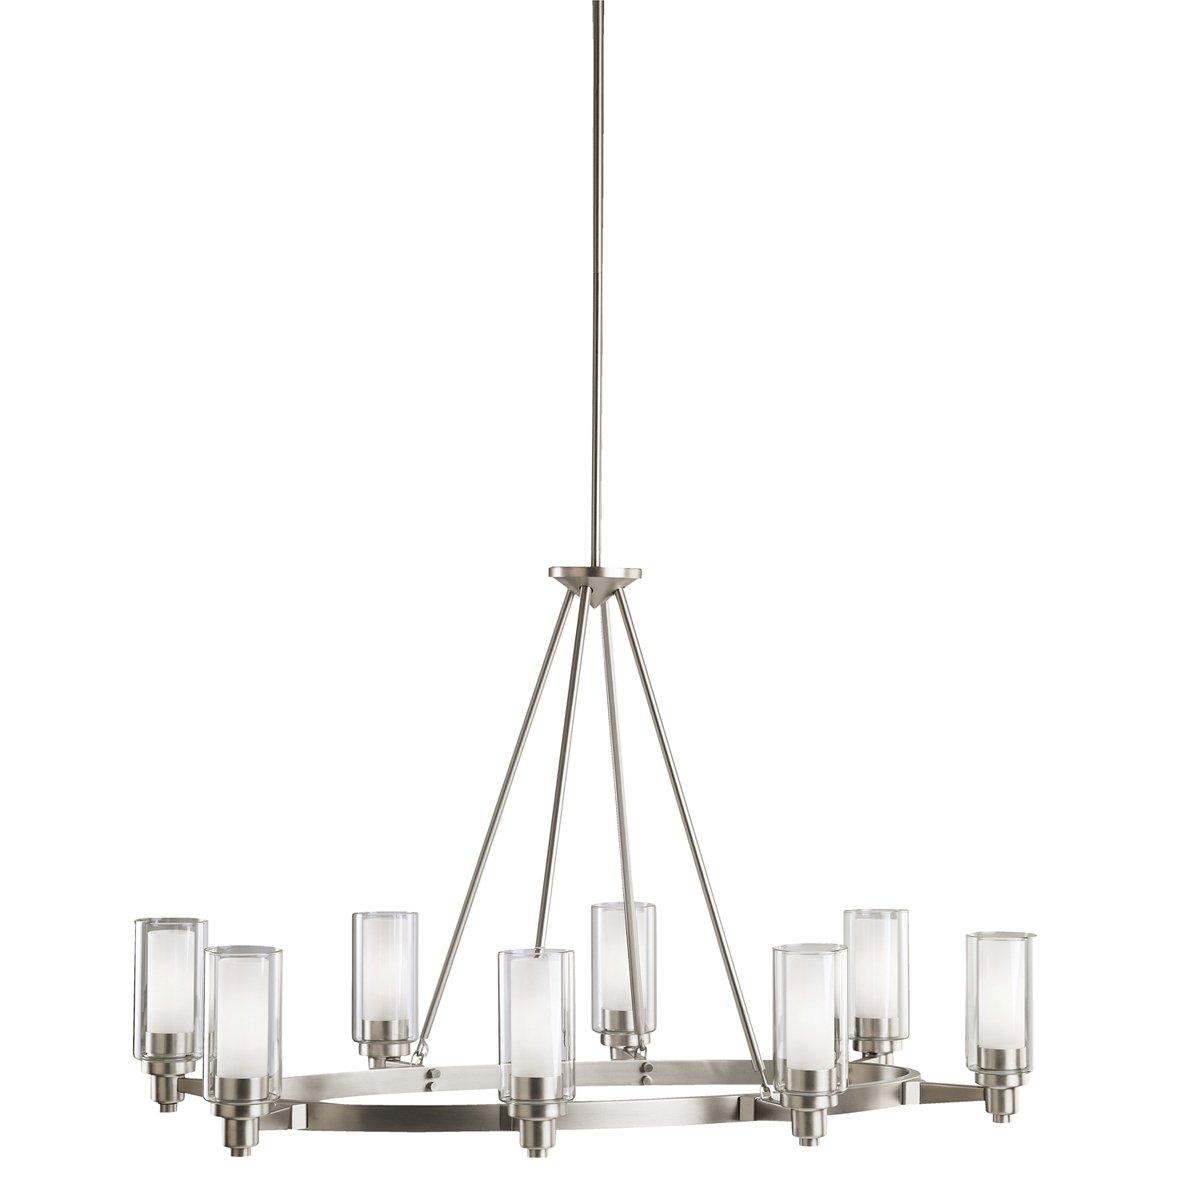 office chandelier lighting. Kichler 2345OZ Circolo Oval Chandelier 8-Light, Olde Bronze - Ceiling Pendant Fixtures Amazon.com Office Lighting